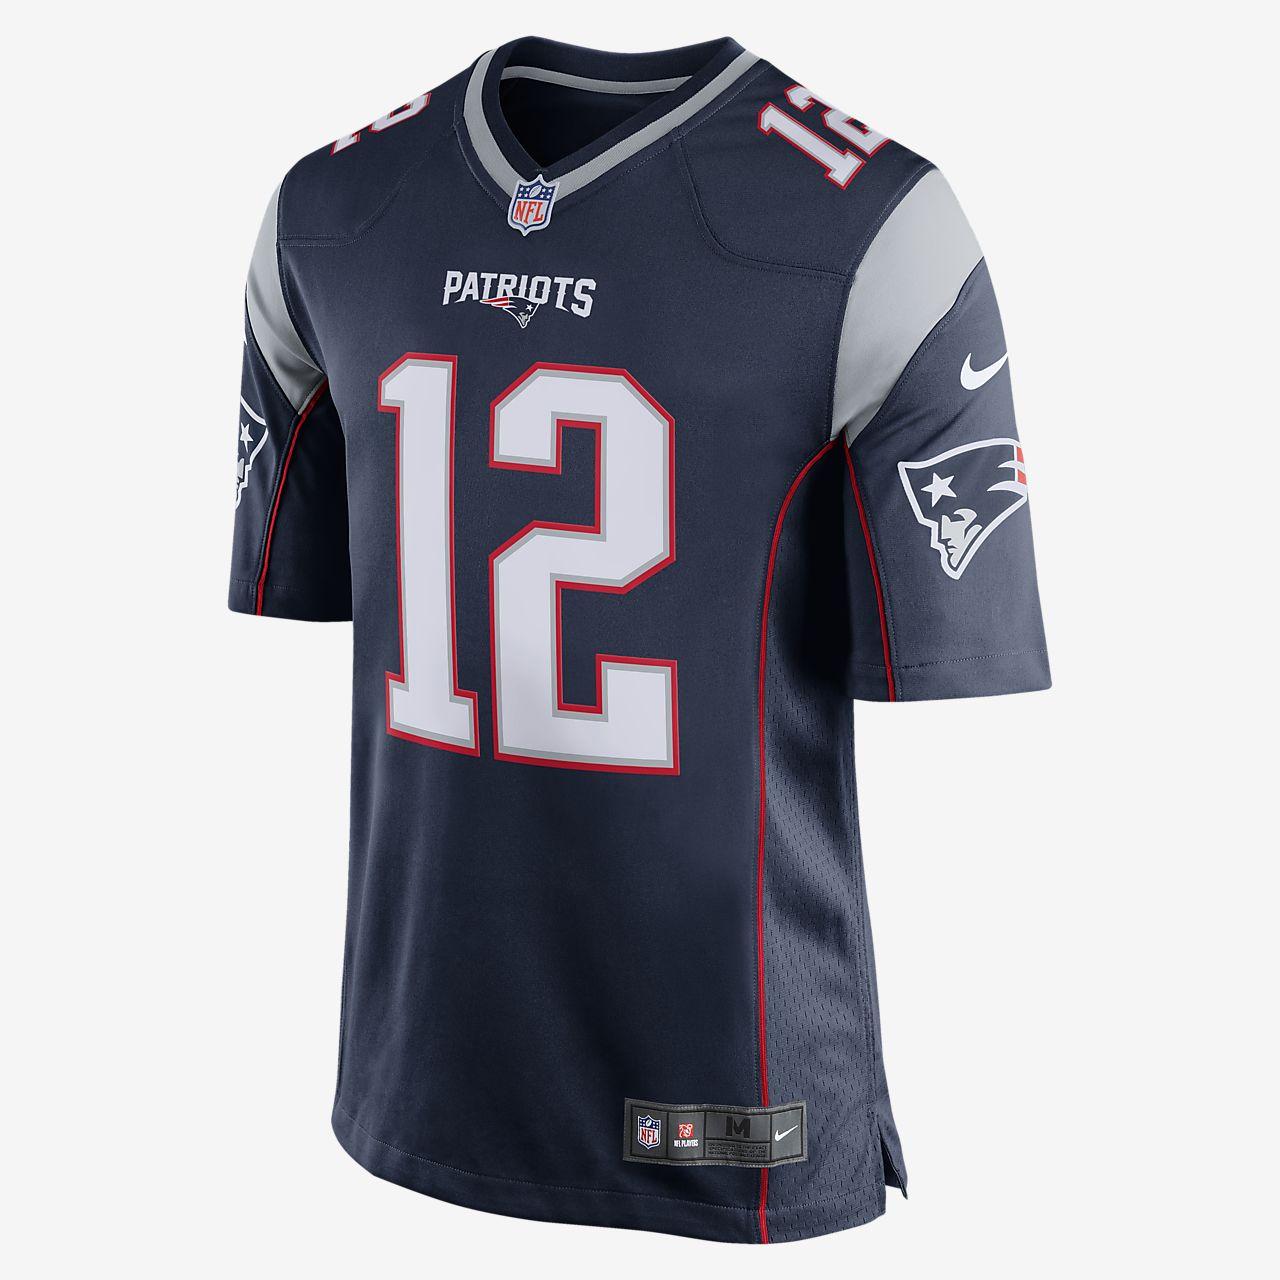 ... Jersey de fútbol de local para hombre de los New England Patriots de NFL  (Tom aca3fe32b6e